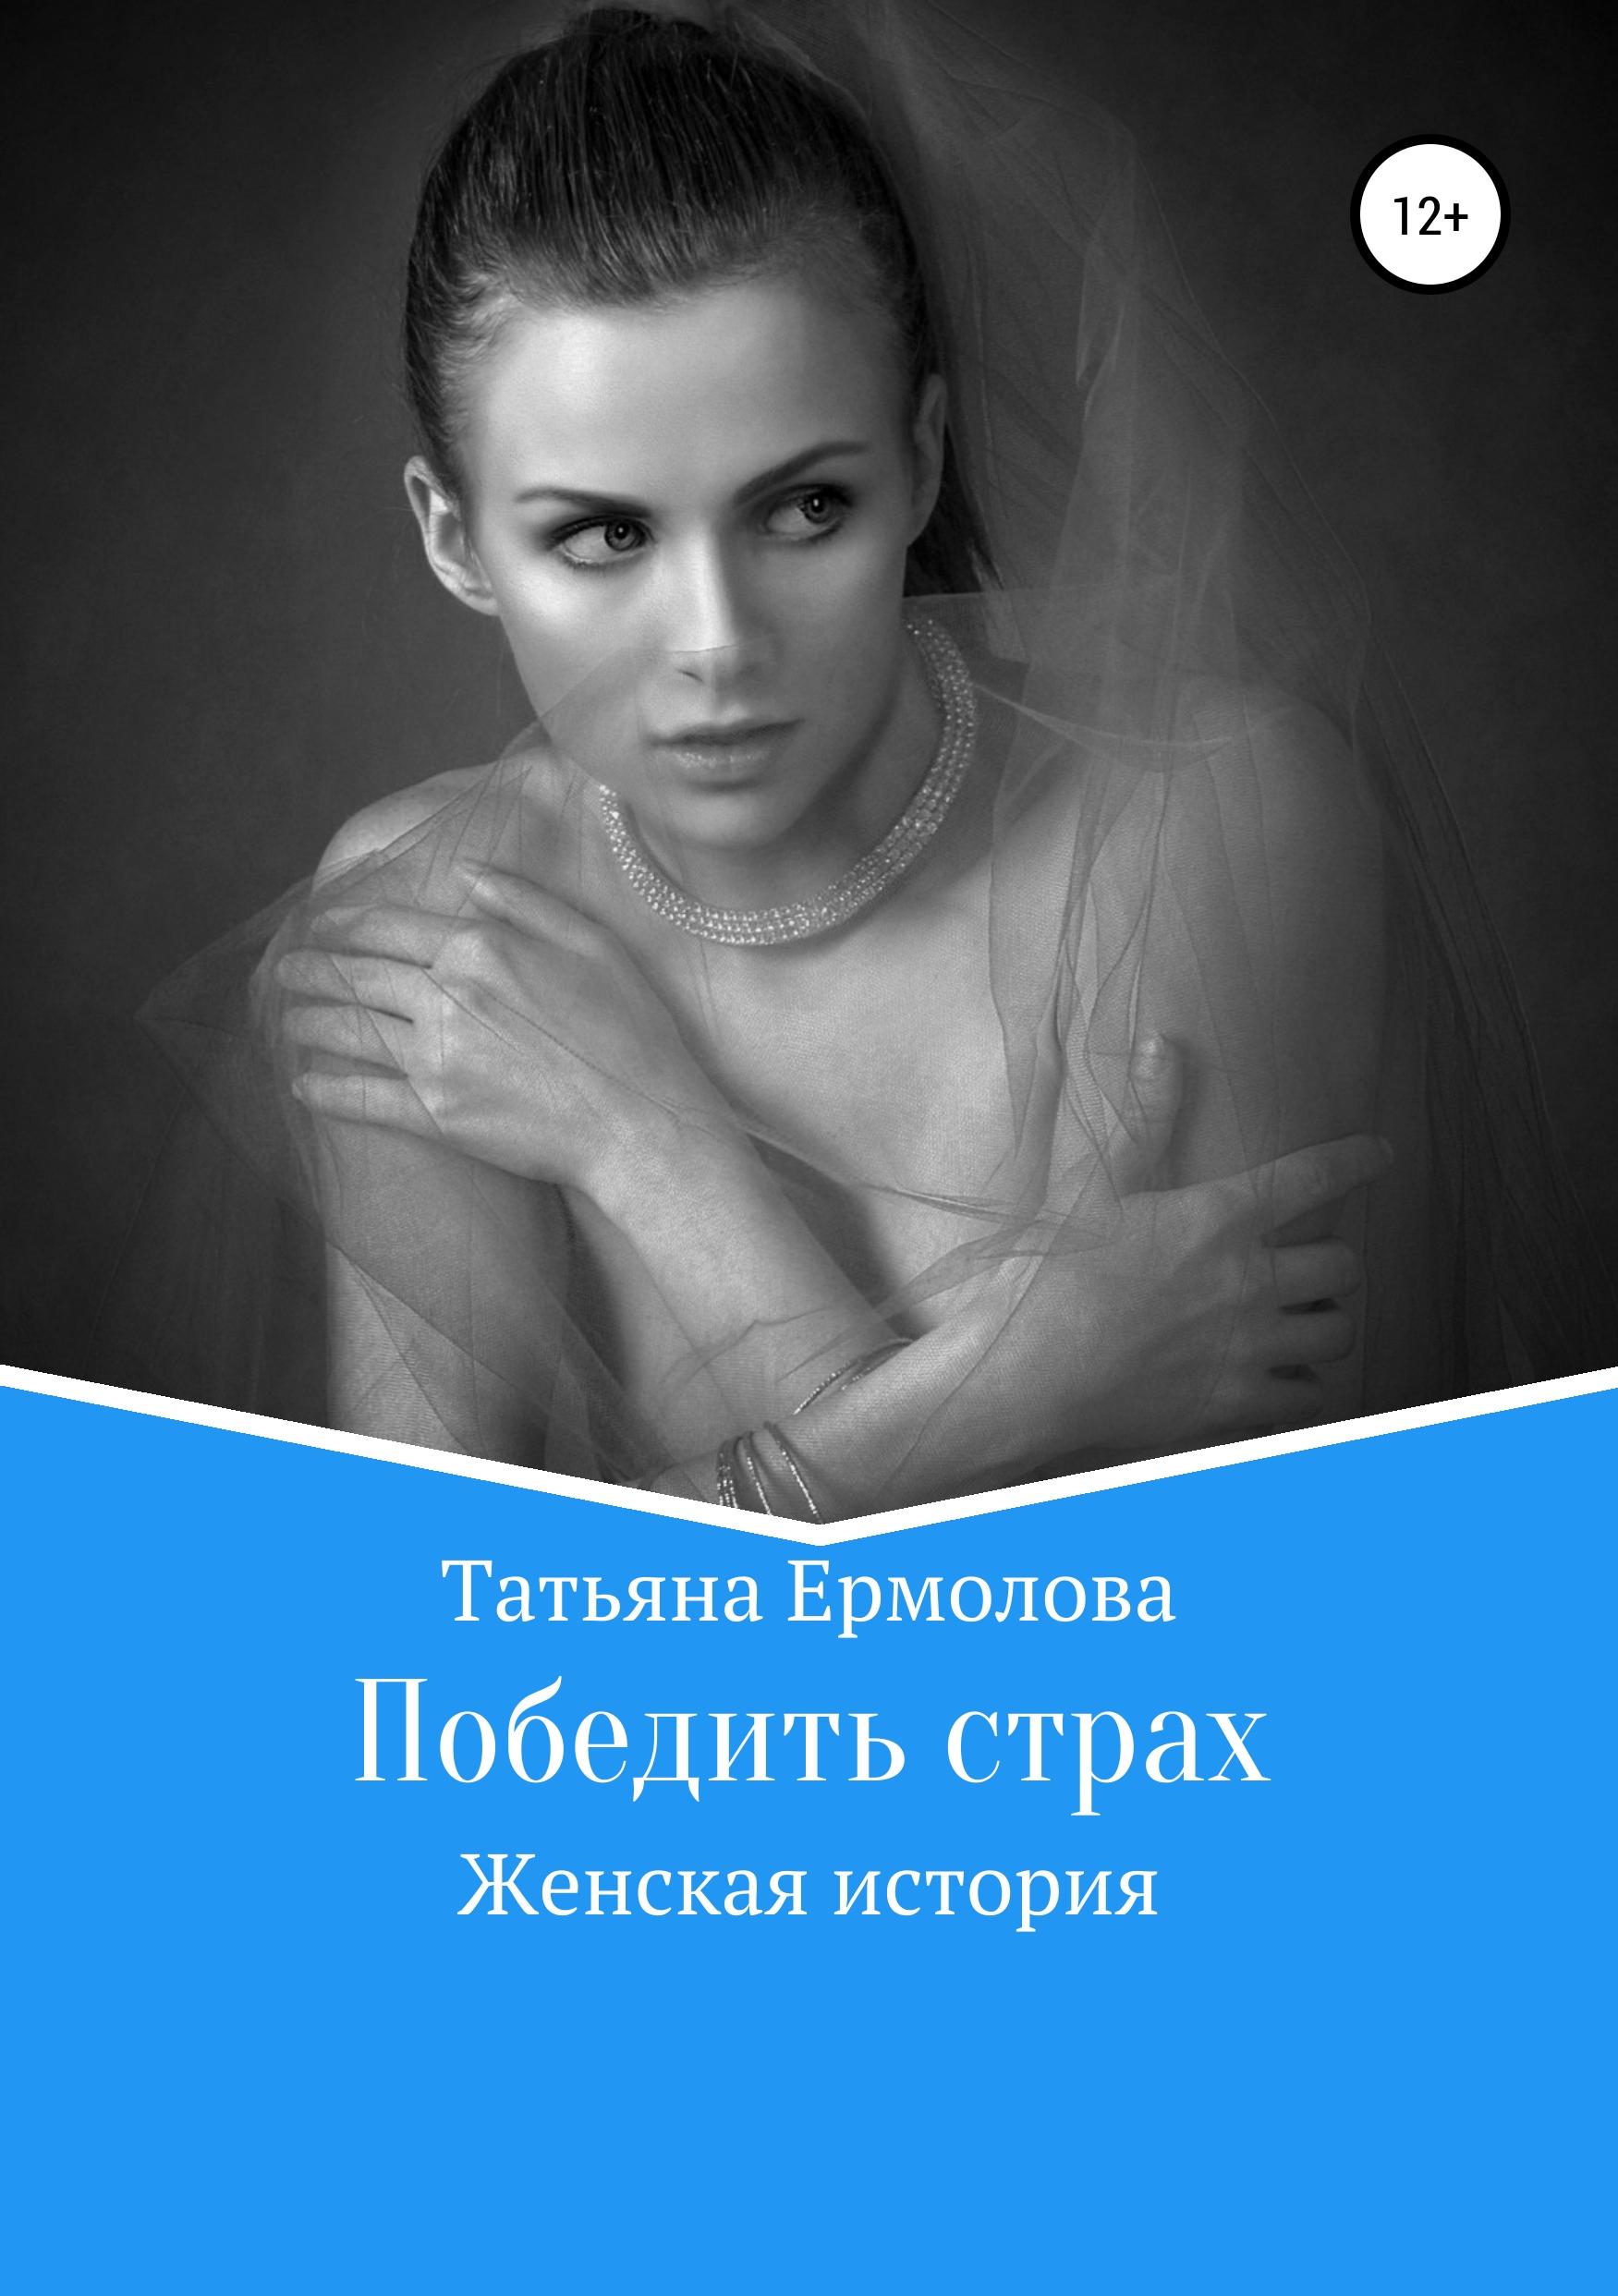 Татьяна Александровна Ермолова Победить страх татьяна юрьевна трунова я останусь человеком